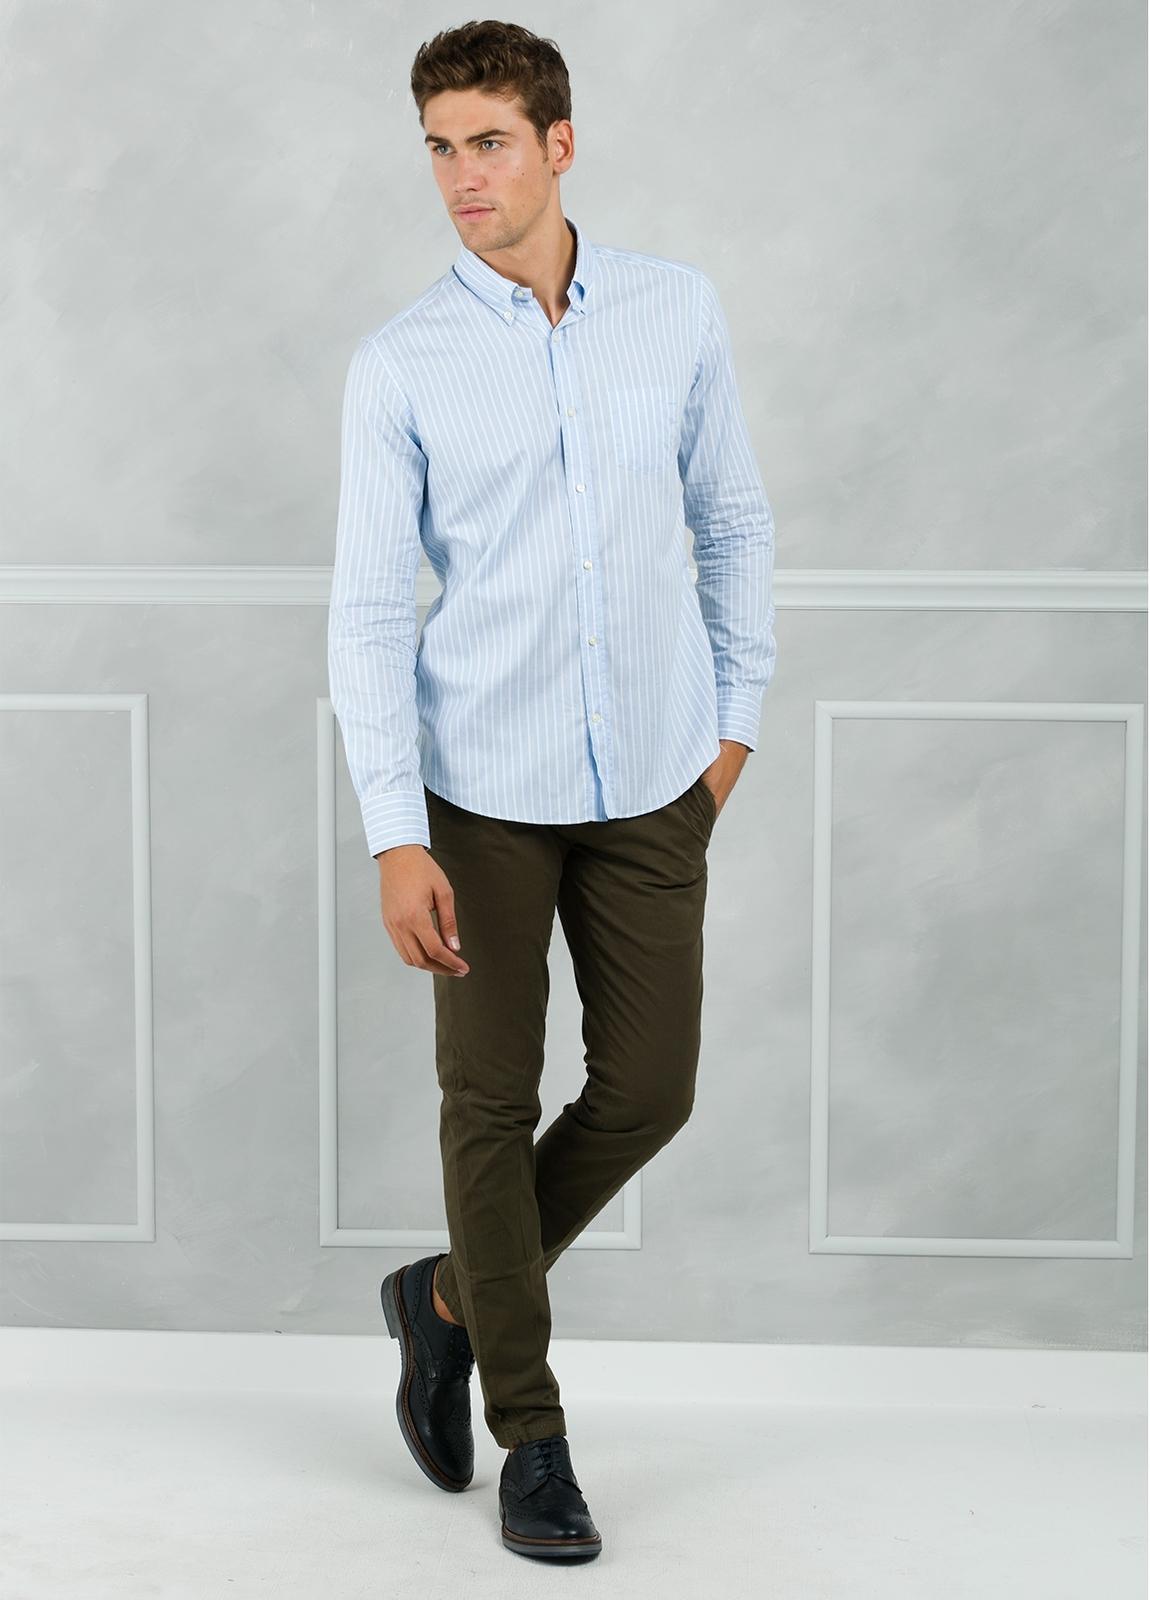 Camisa Leisure Wear REGULAR FIT Modelo BOTTON DOWN de rayas, color celeste. 100% Algodón. - Ítem2